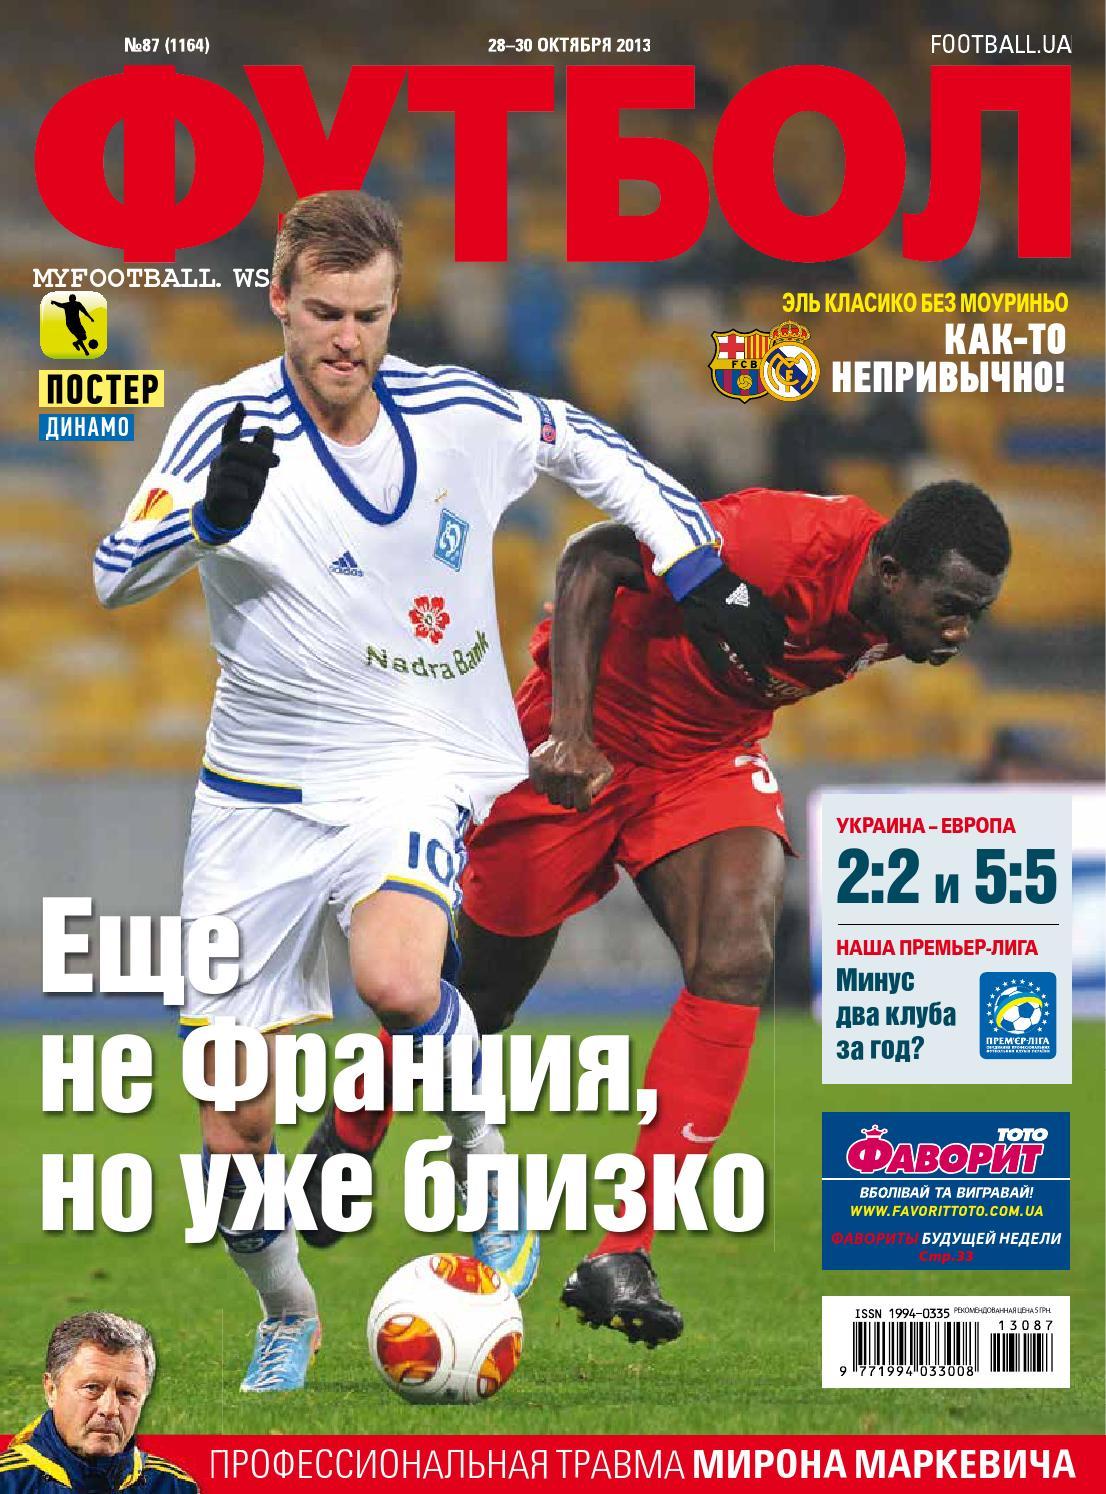 Кобахидзе: очень тяжелая погода для футбола